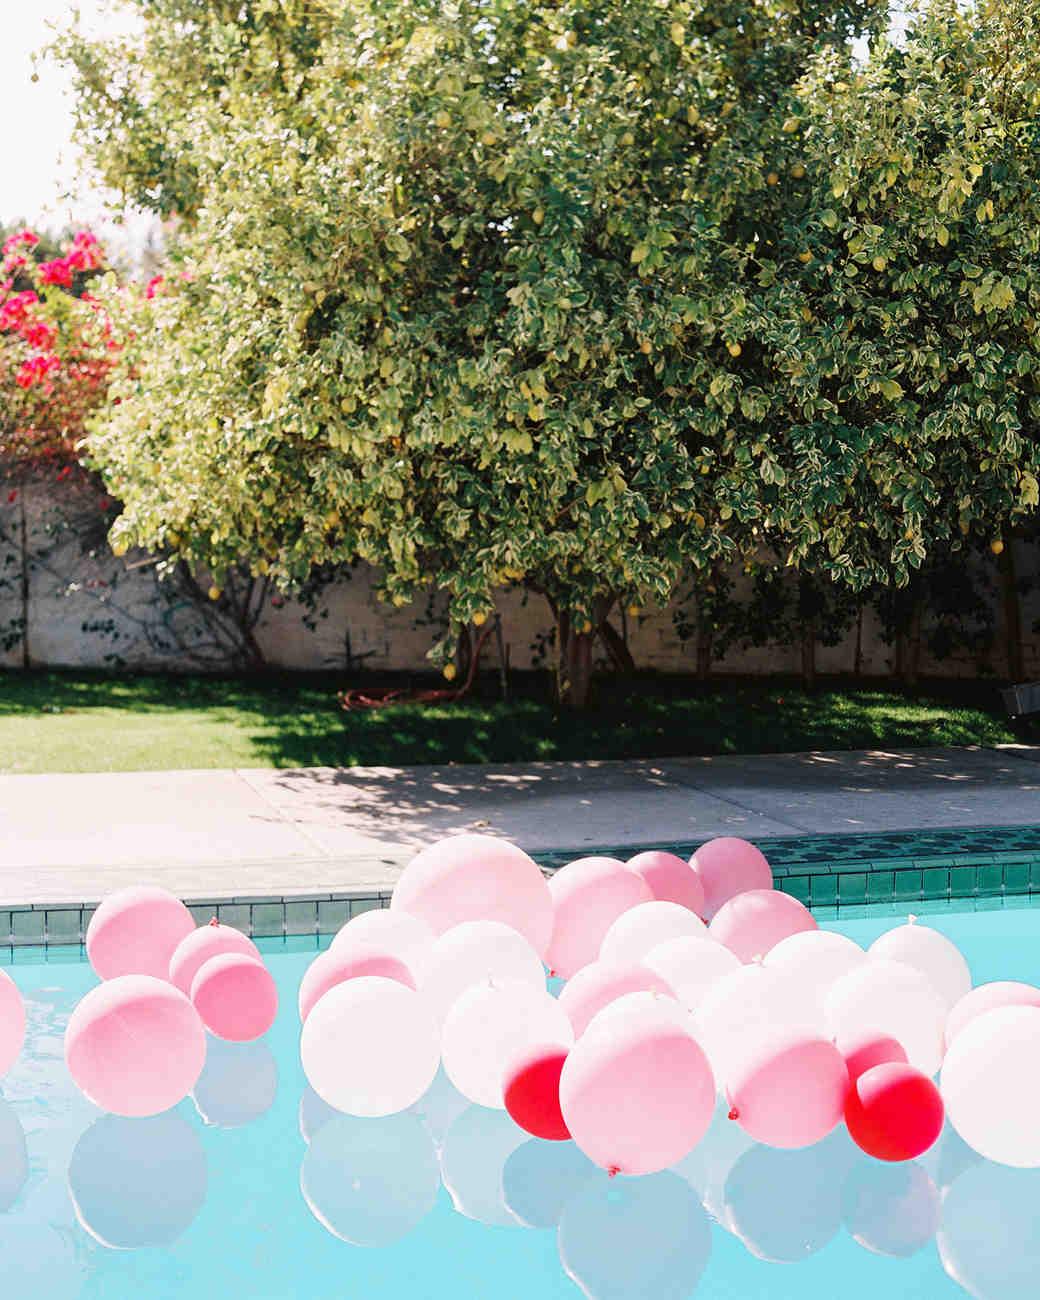 kelly-jeff-wedding-palm-springs-balloons-pool-0125-s112234.jpg